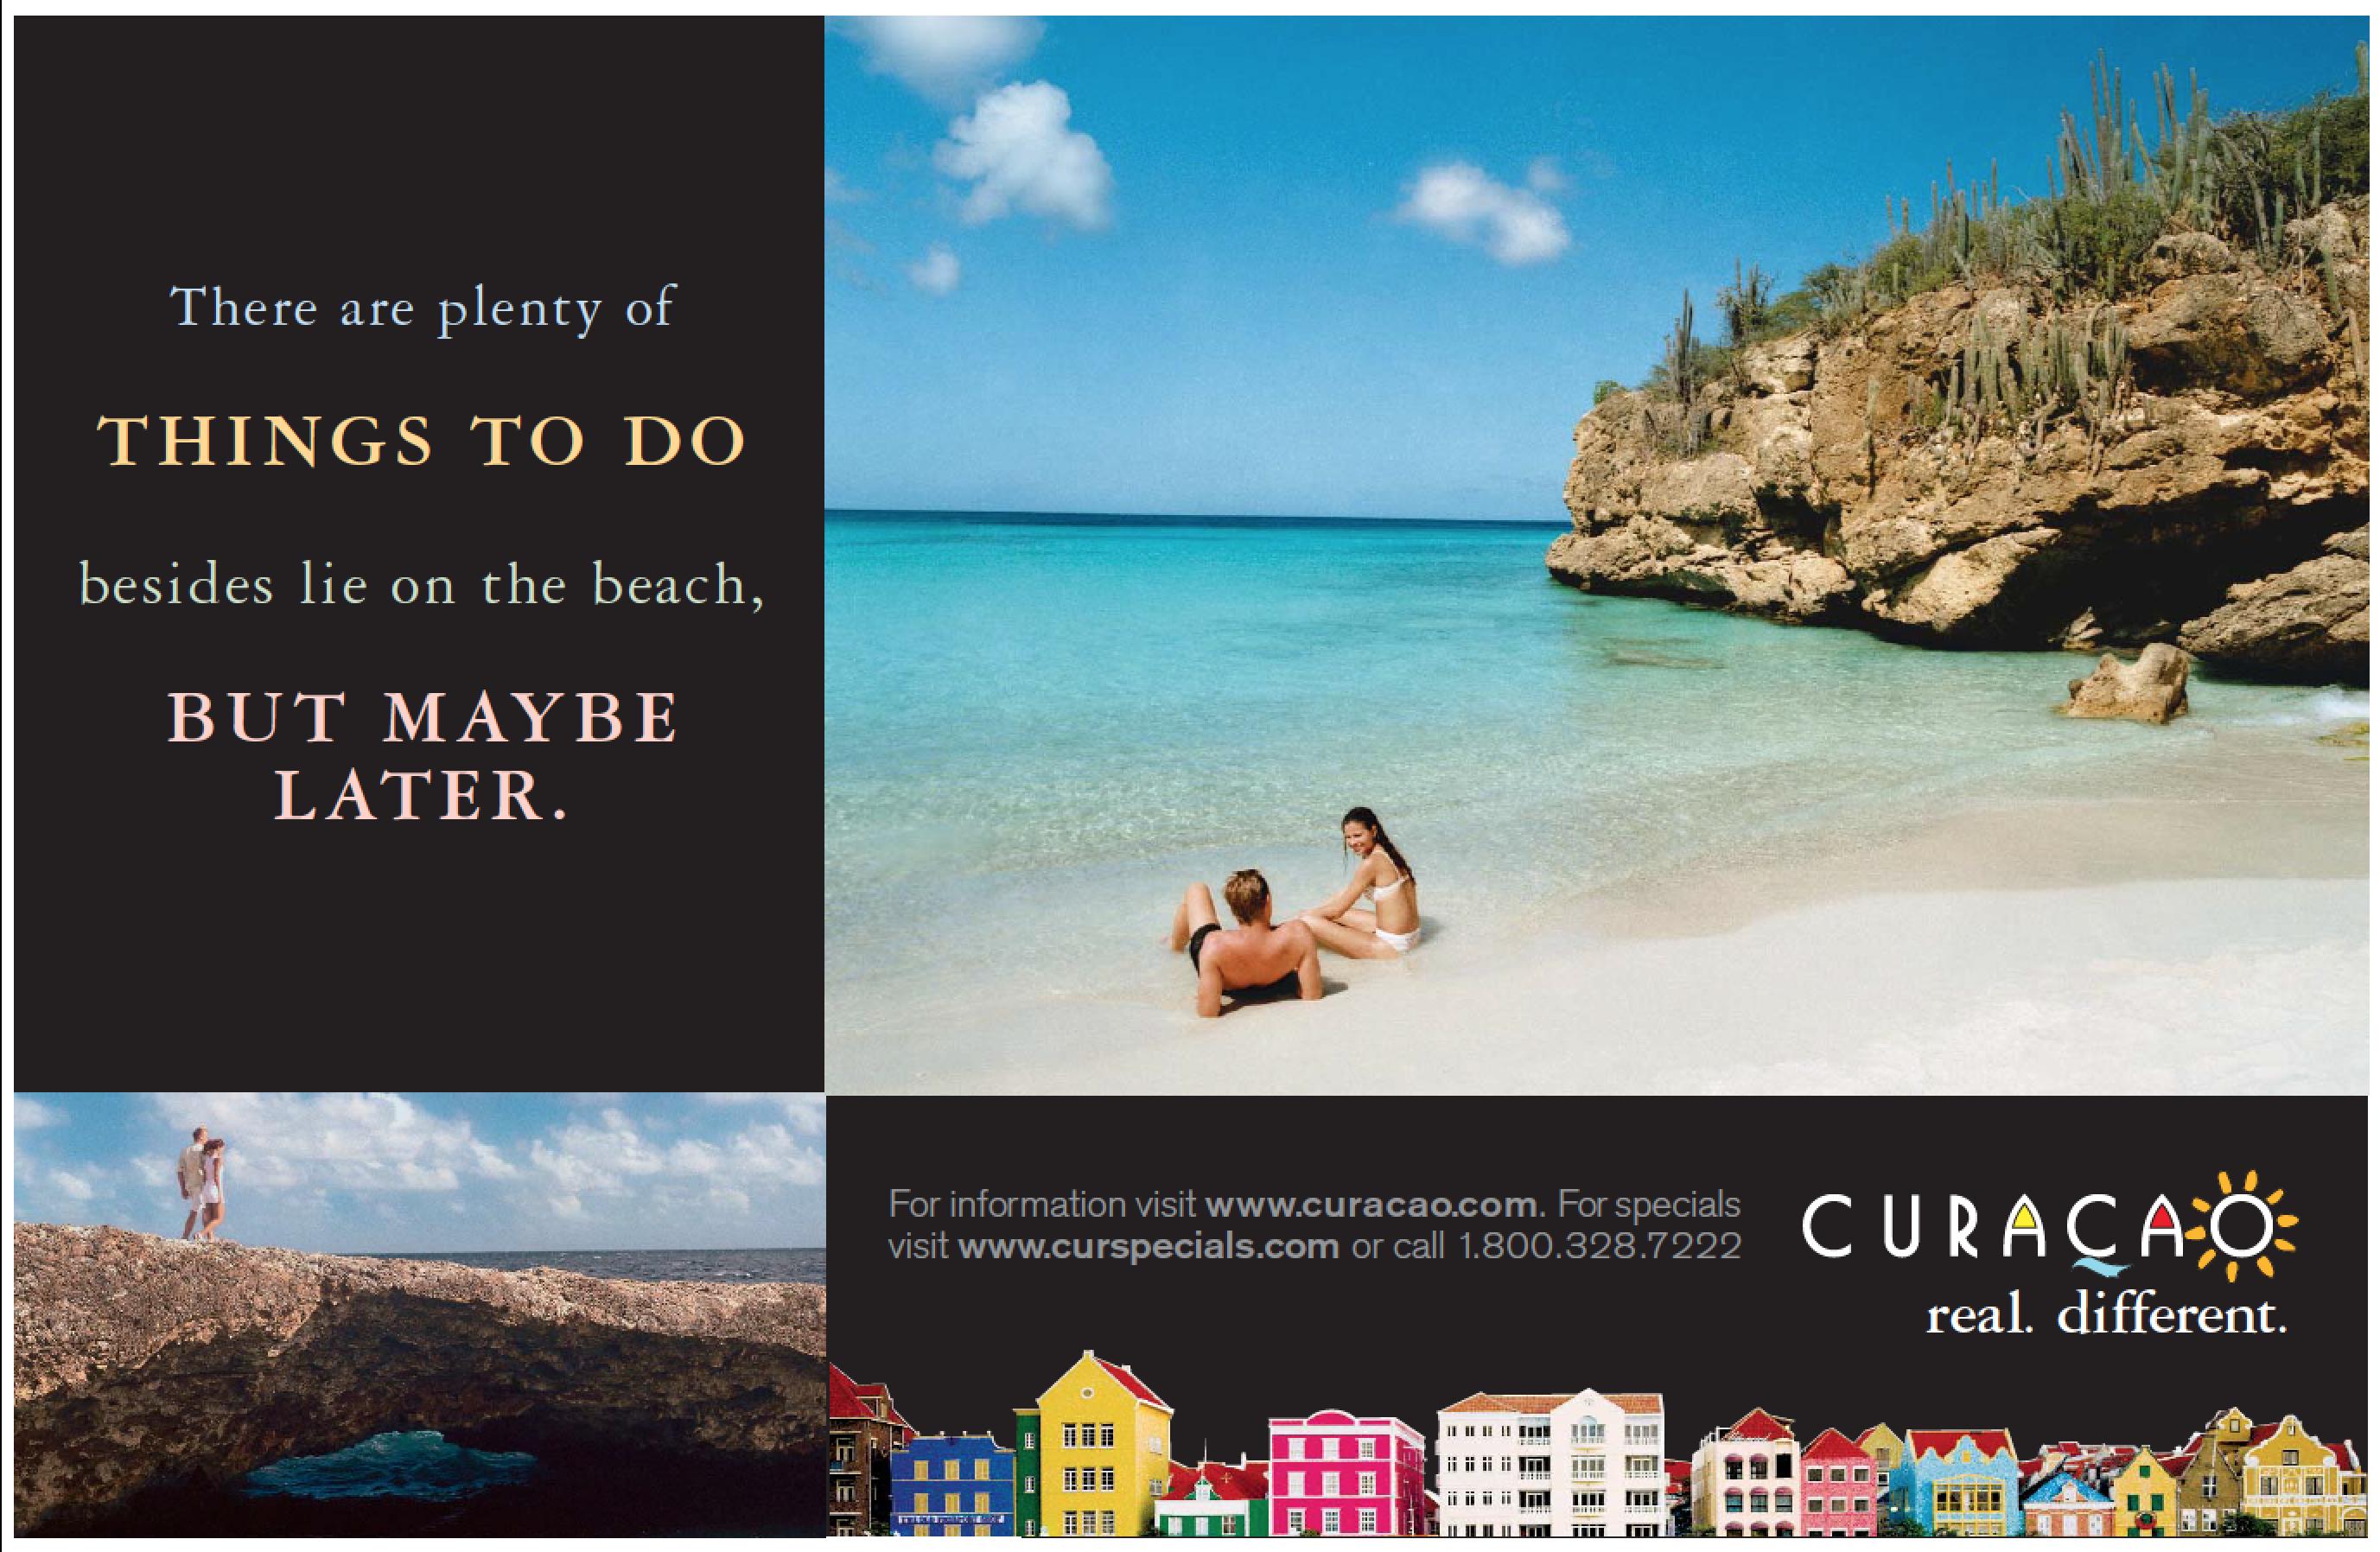 Curacao_PlentyToDo